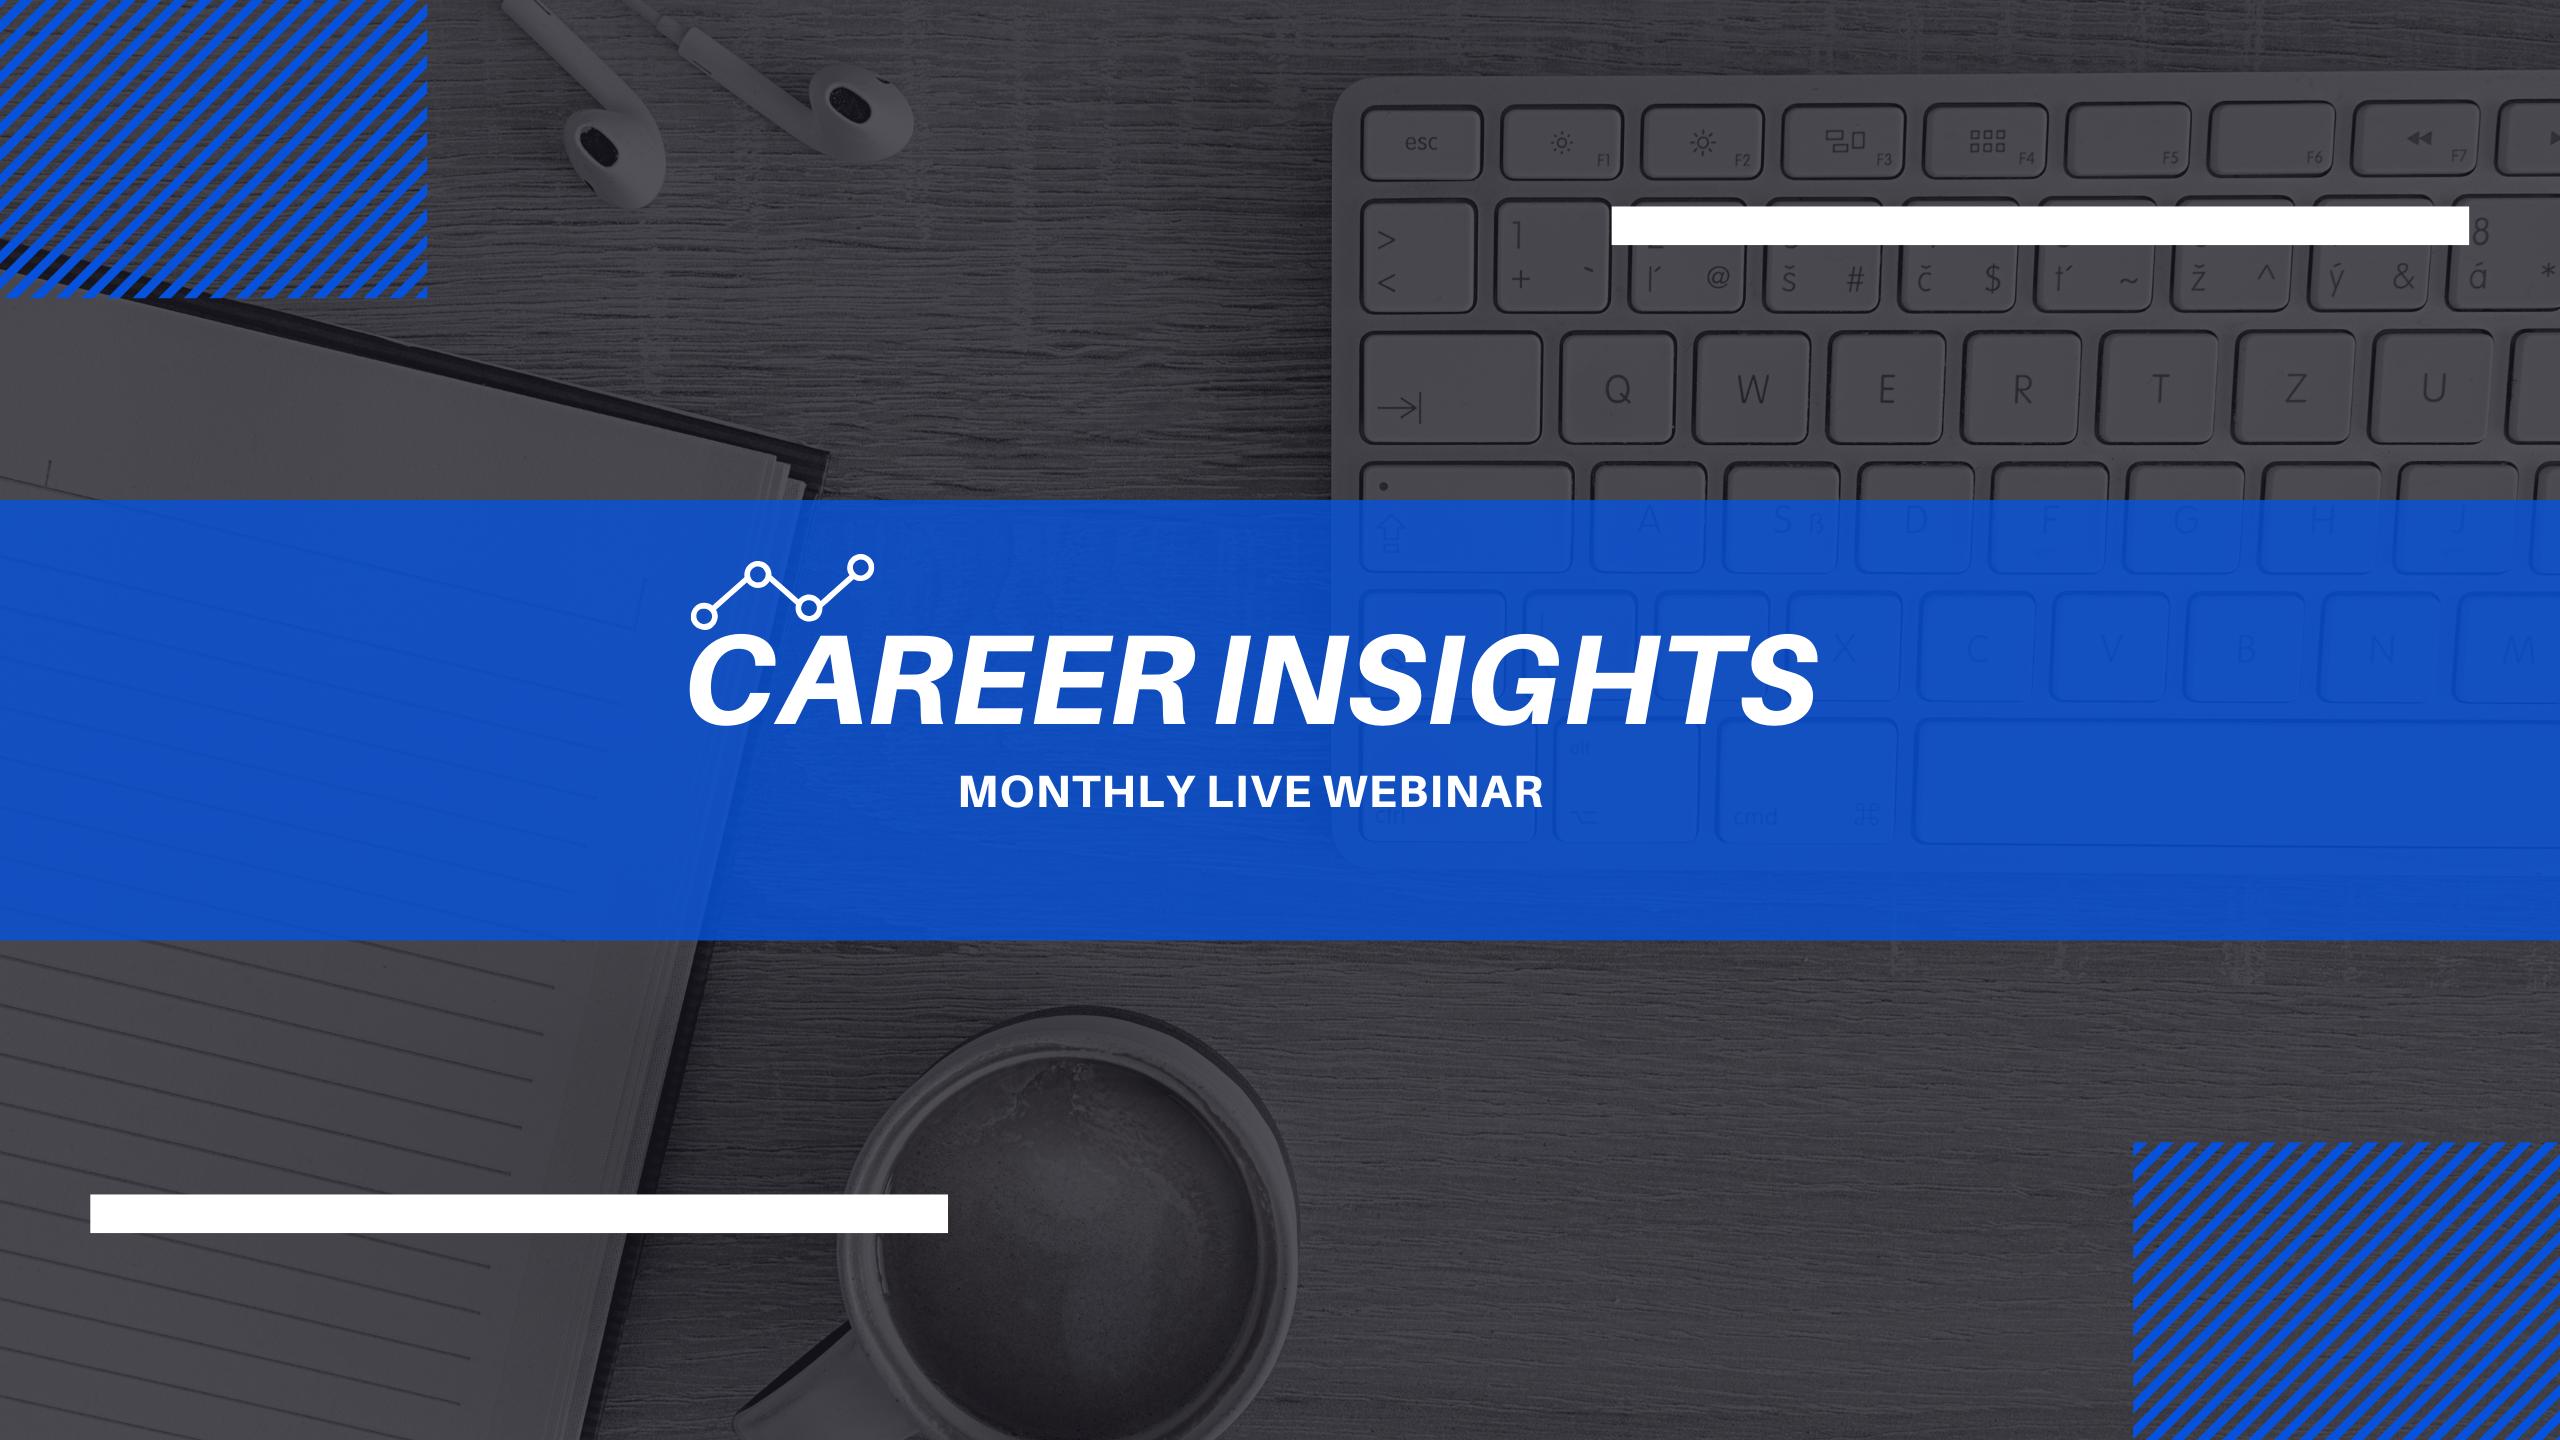 Career Insights: Monthly Digital Workshop - La Orotava